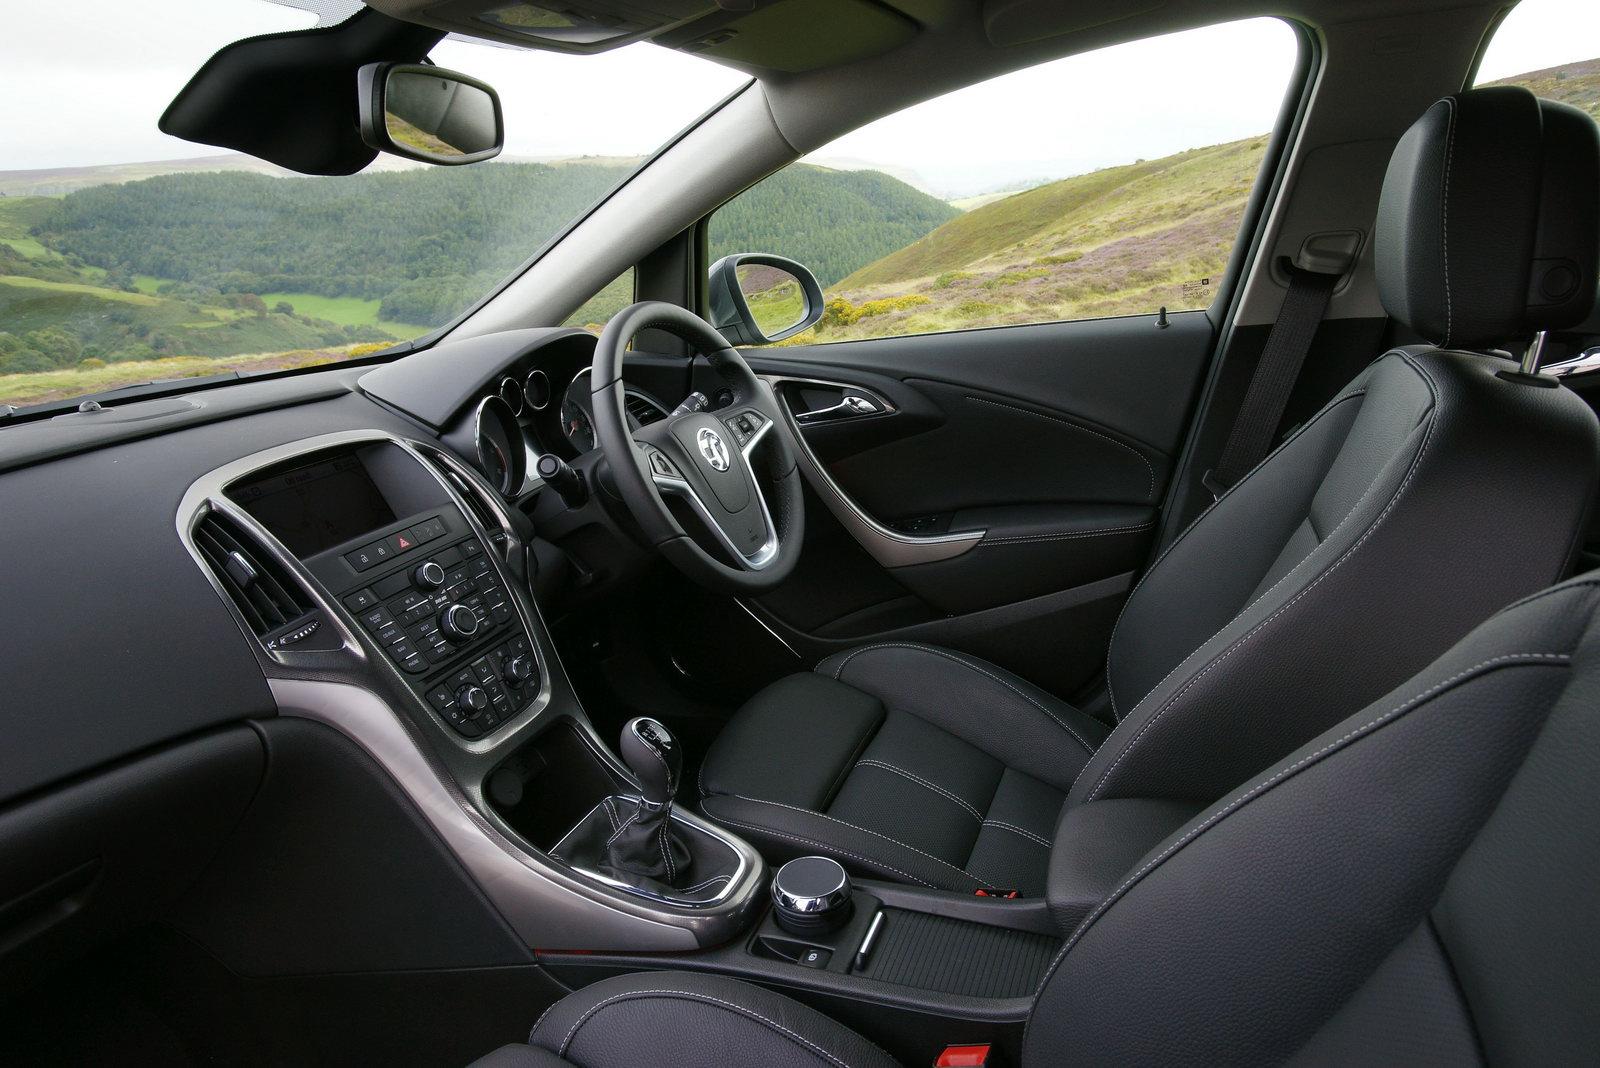 2010-Vauxhall-Astra-4.jpg